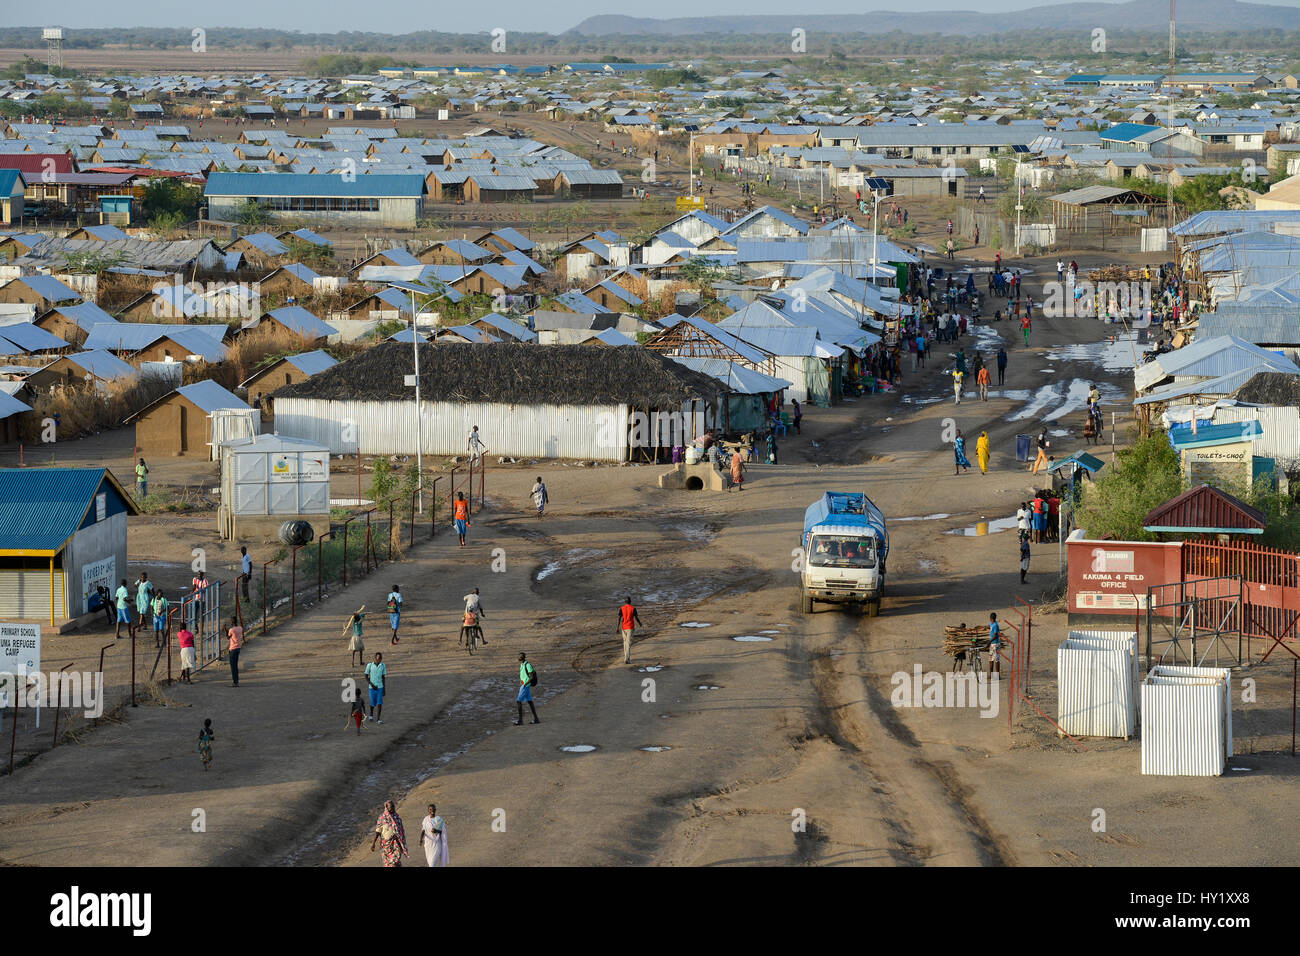 KENYA, Turkana, refugee camp Kakuma for 160.000 refugees, Kakuma IV for mainly south sudanese refugees, water tanker - Stock Image